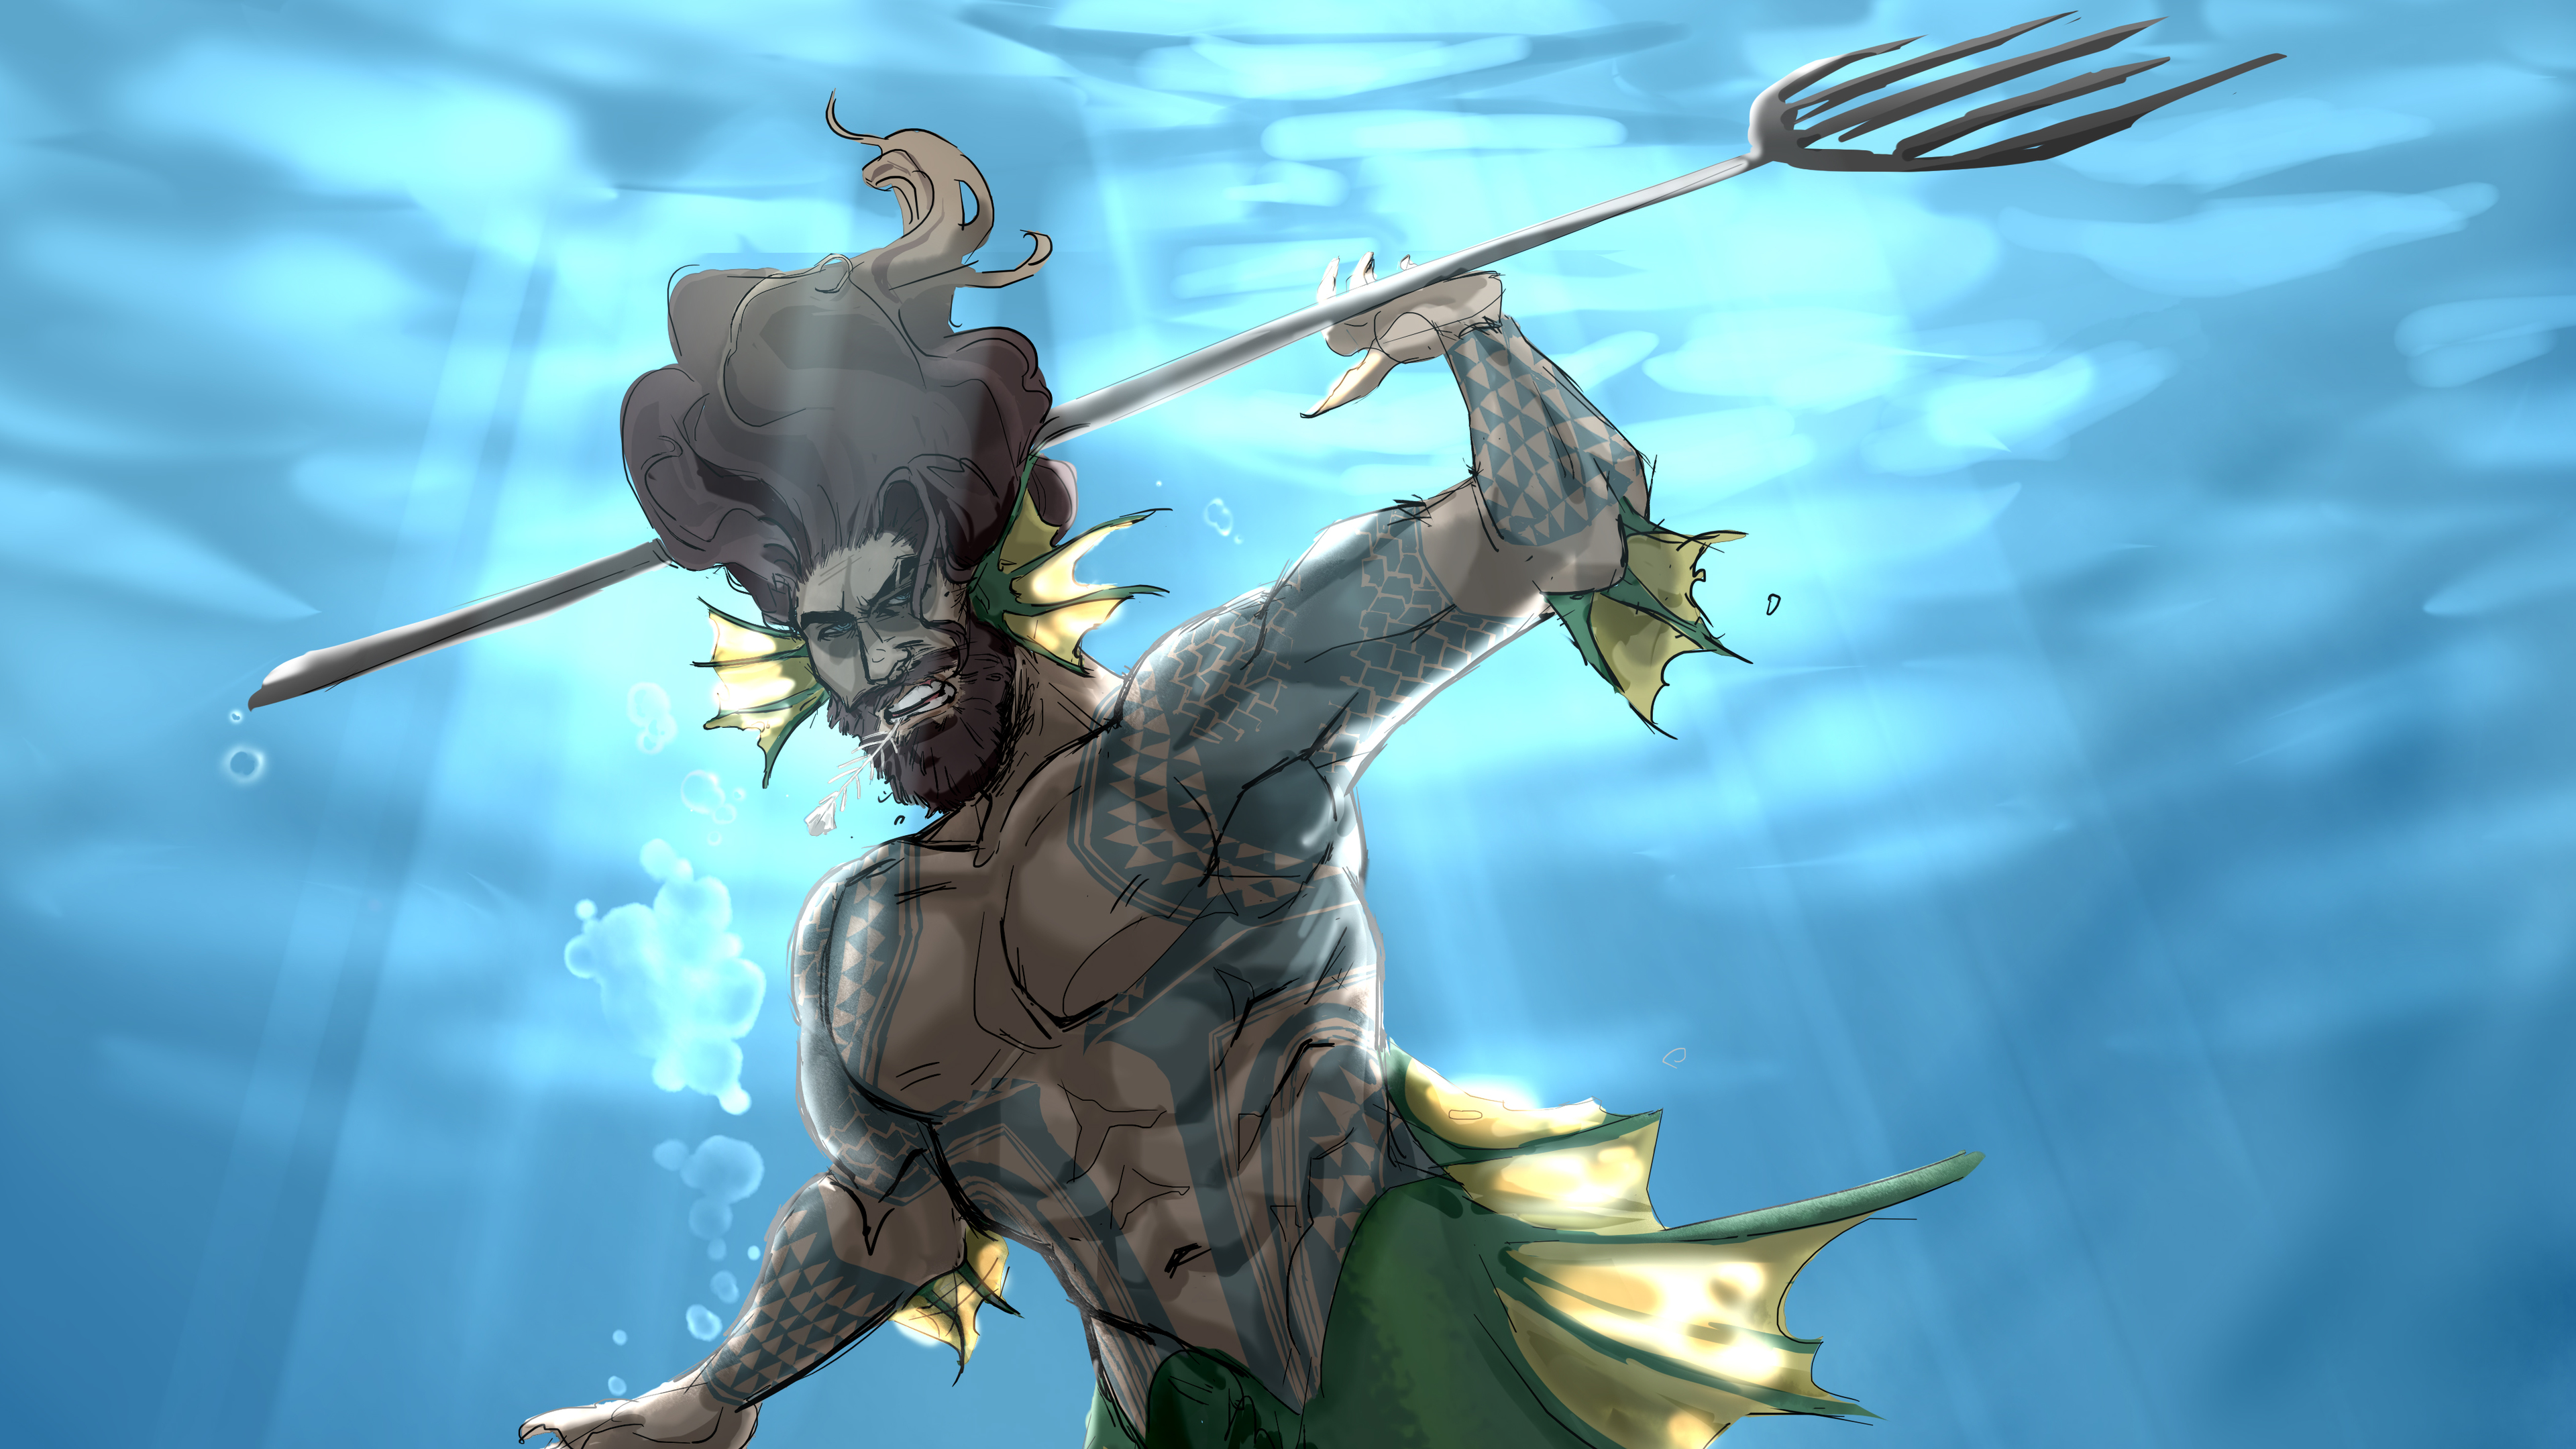 aquaman comic art 4k 1541294304 - Aquaman Comic Art 4k - superheroes wallpapers, hd-wallpapers, digital art wallpapers, deviantart wallpapers, artwork wallpapers, artist wallpapers, aquaman wallpapers, 4k-wallpapers